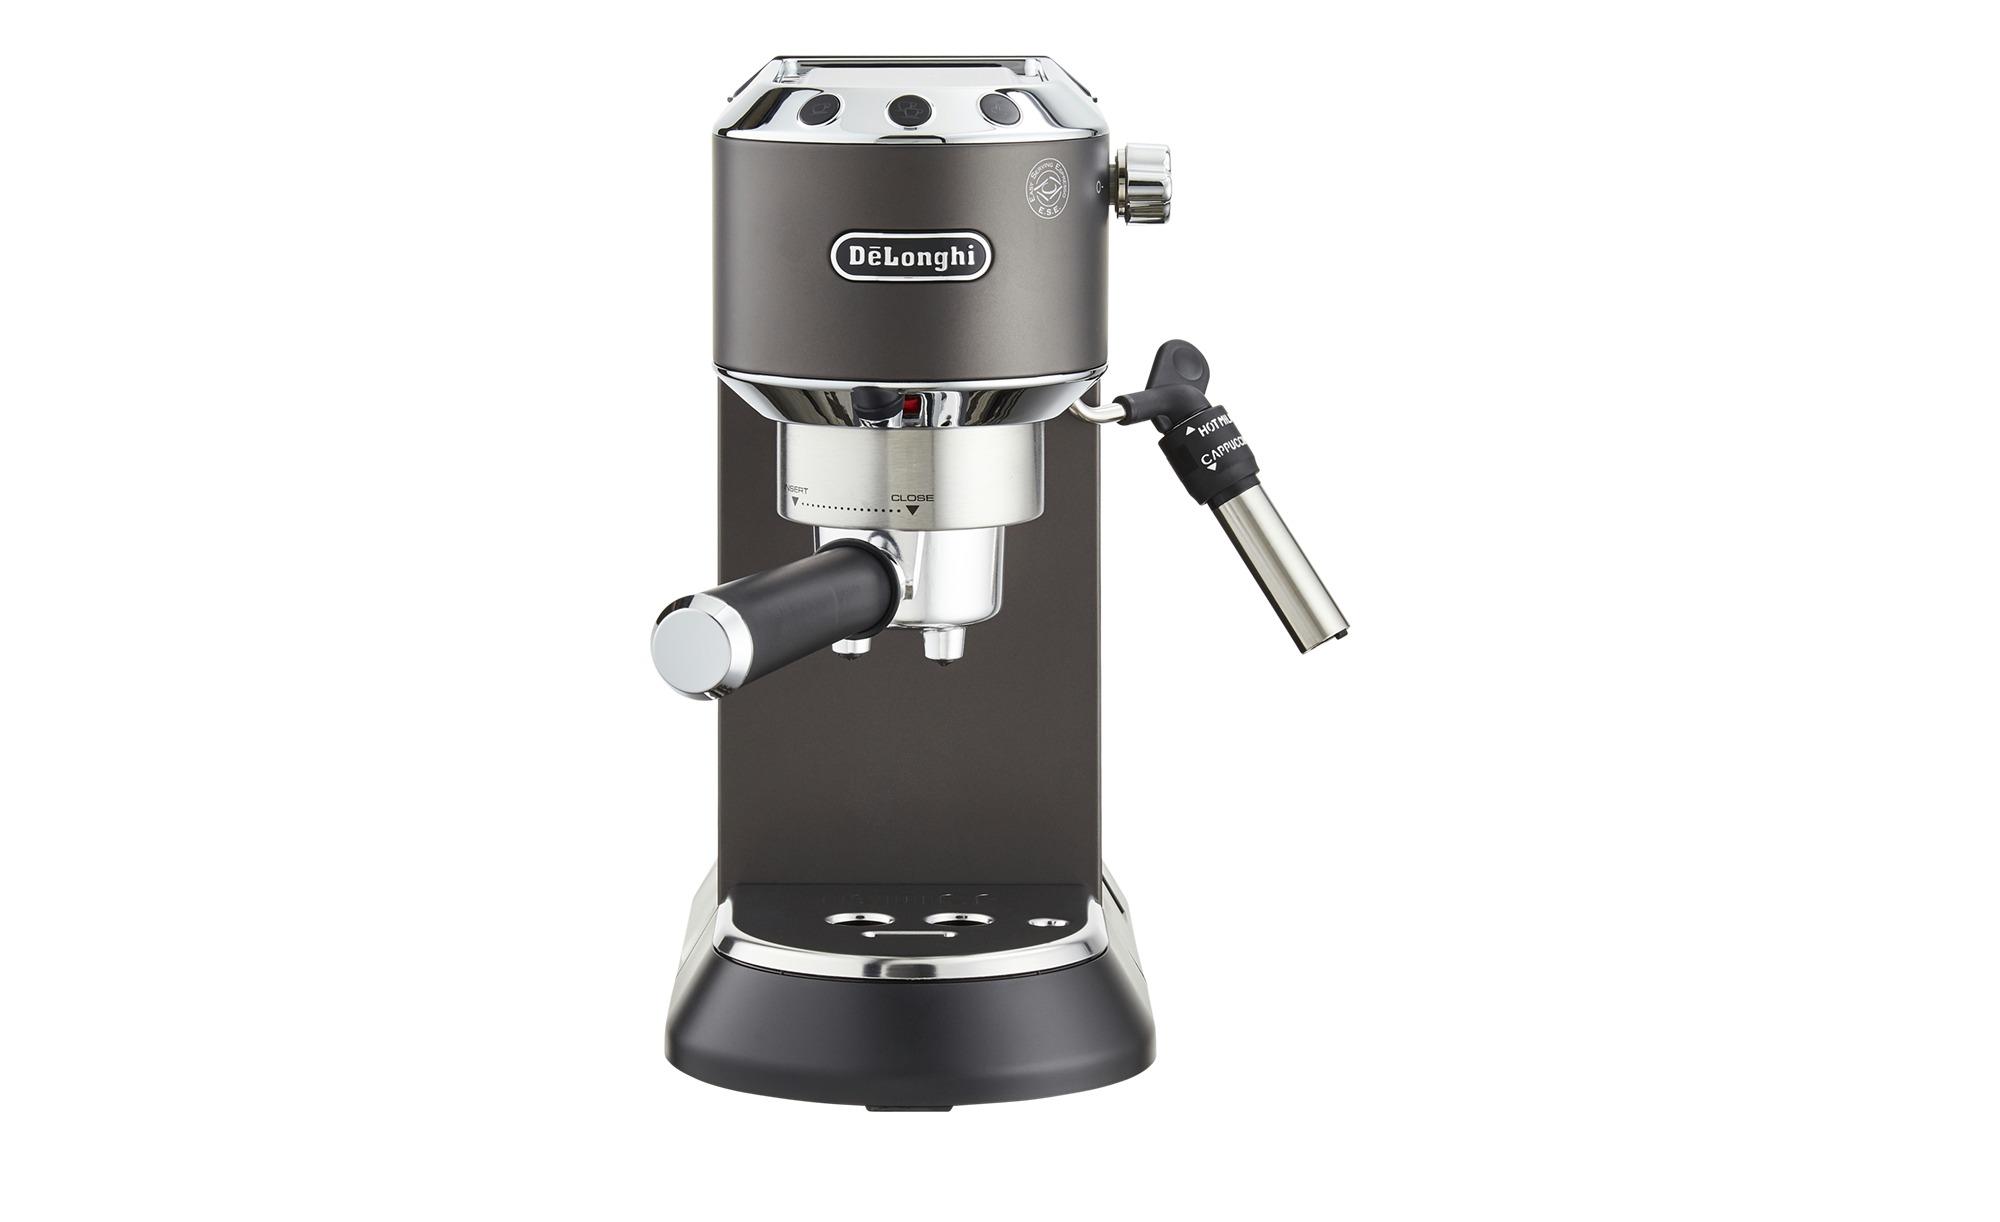 DeLonghi Espresso-Maschine  EC 685.BK Dedica - schwarz - Kunststoff, Metall, Metall-lackiert - 14,9 cm - 30,5 cm - 33 cm - Elektrokleingeräte > Kaffee & Espressomaschinen - Möbel Kraft